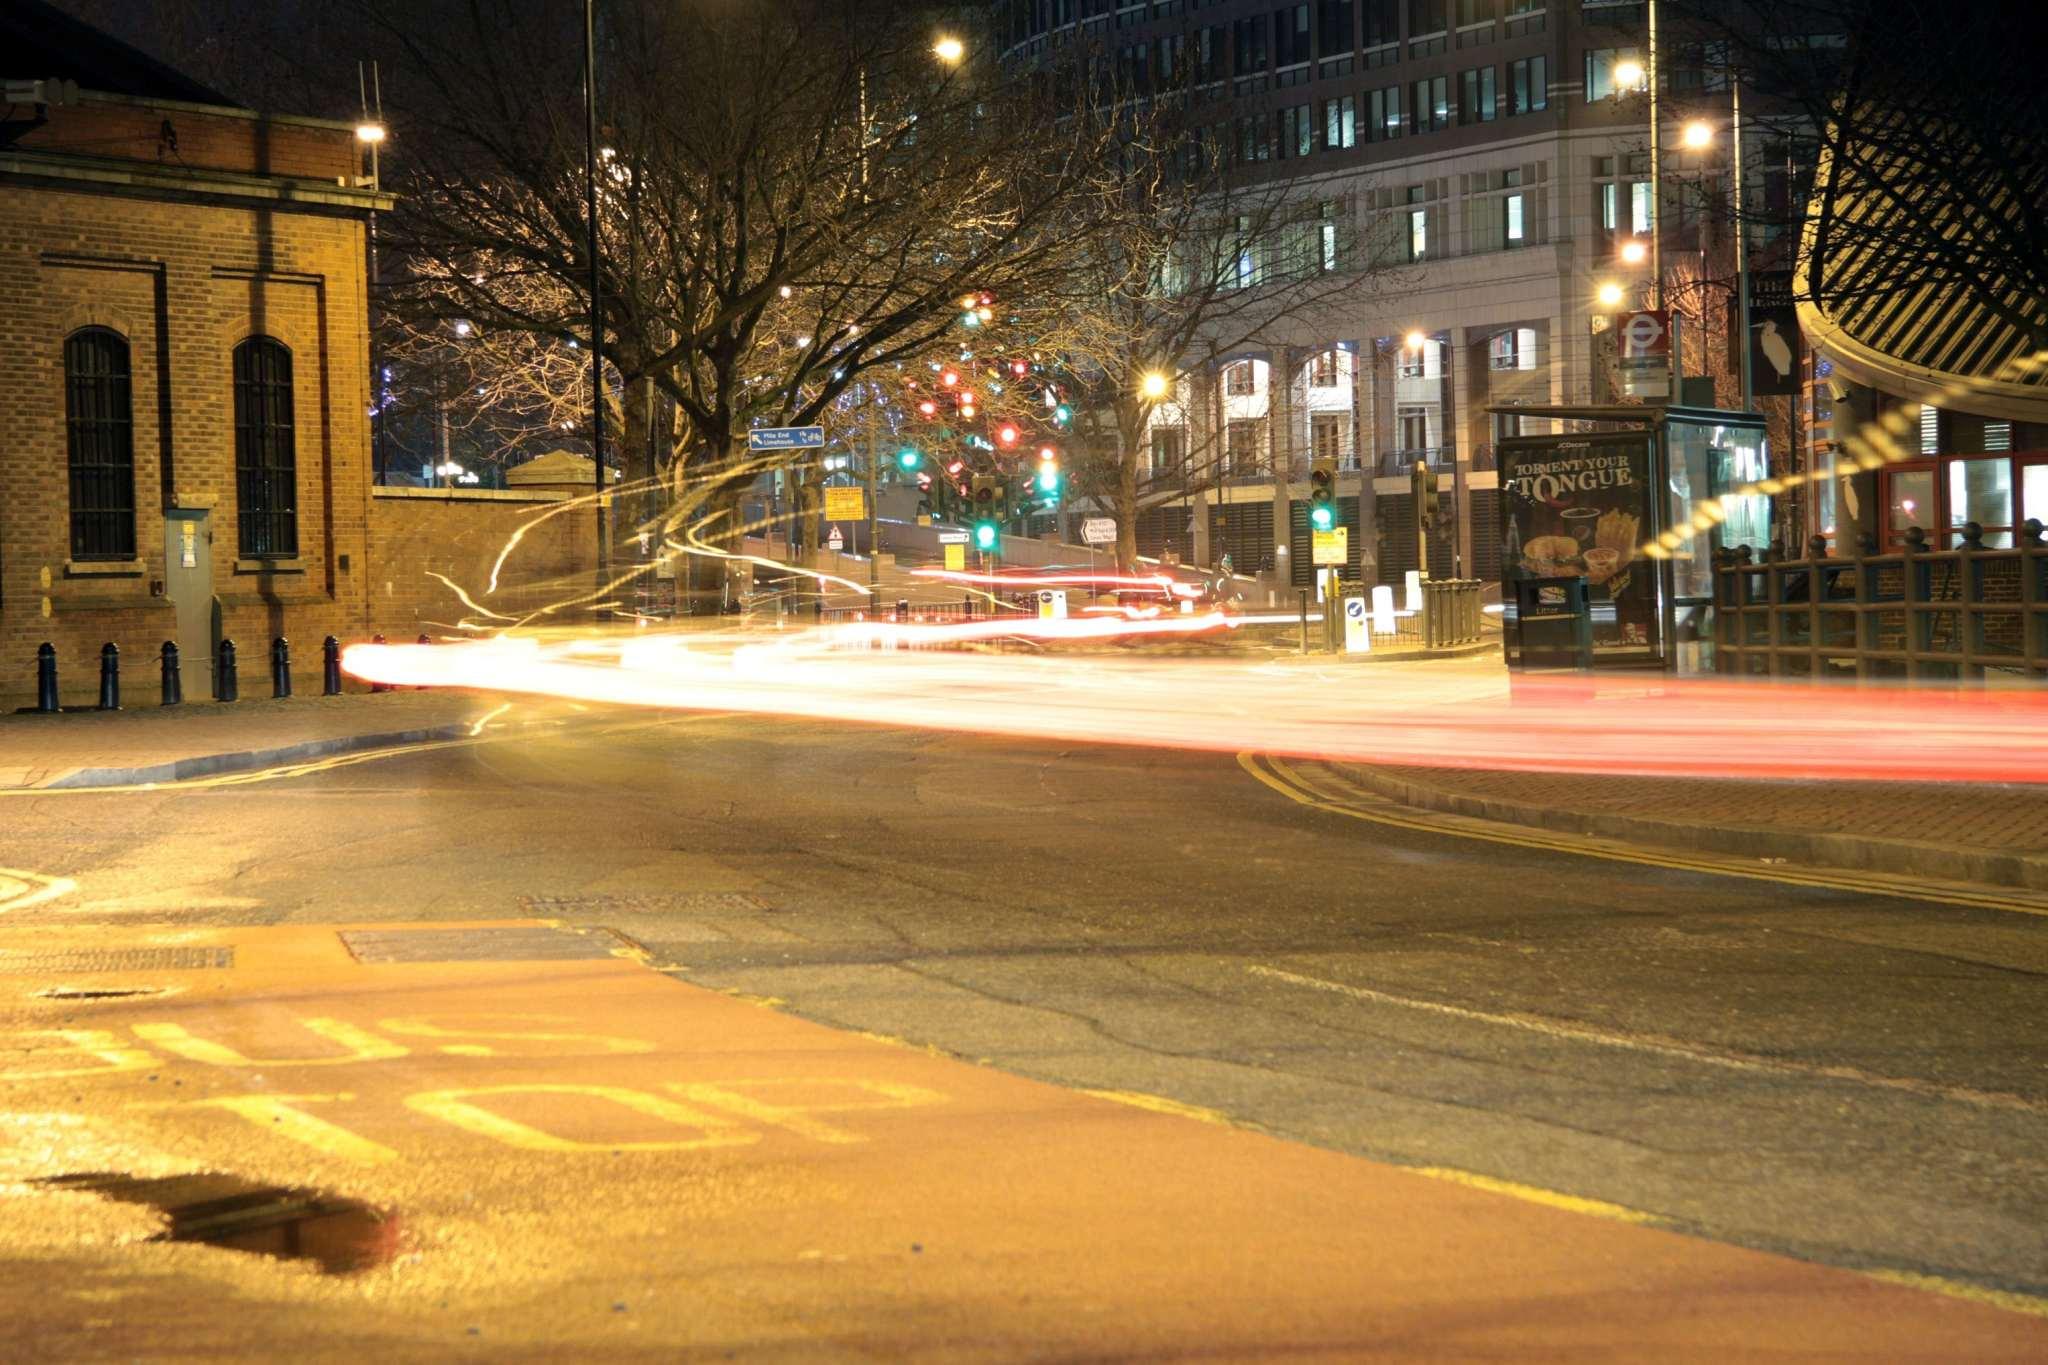 Speeding round corners